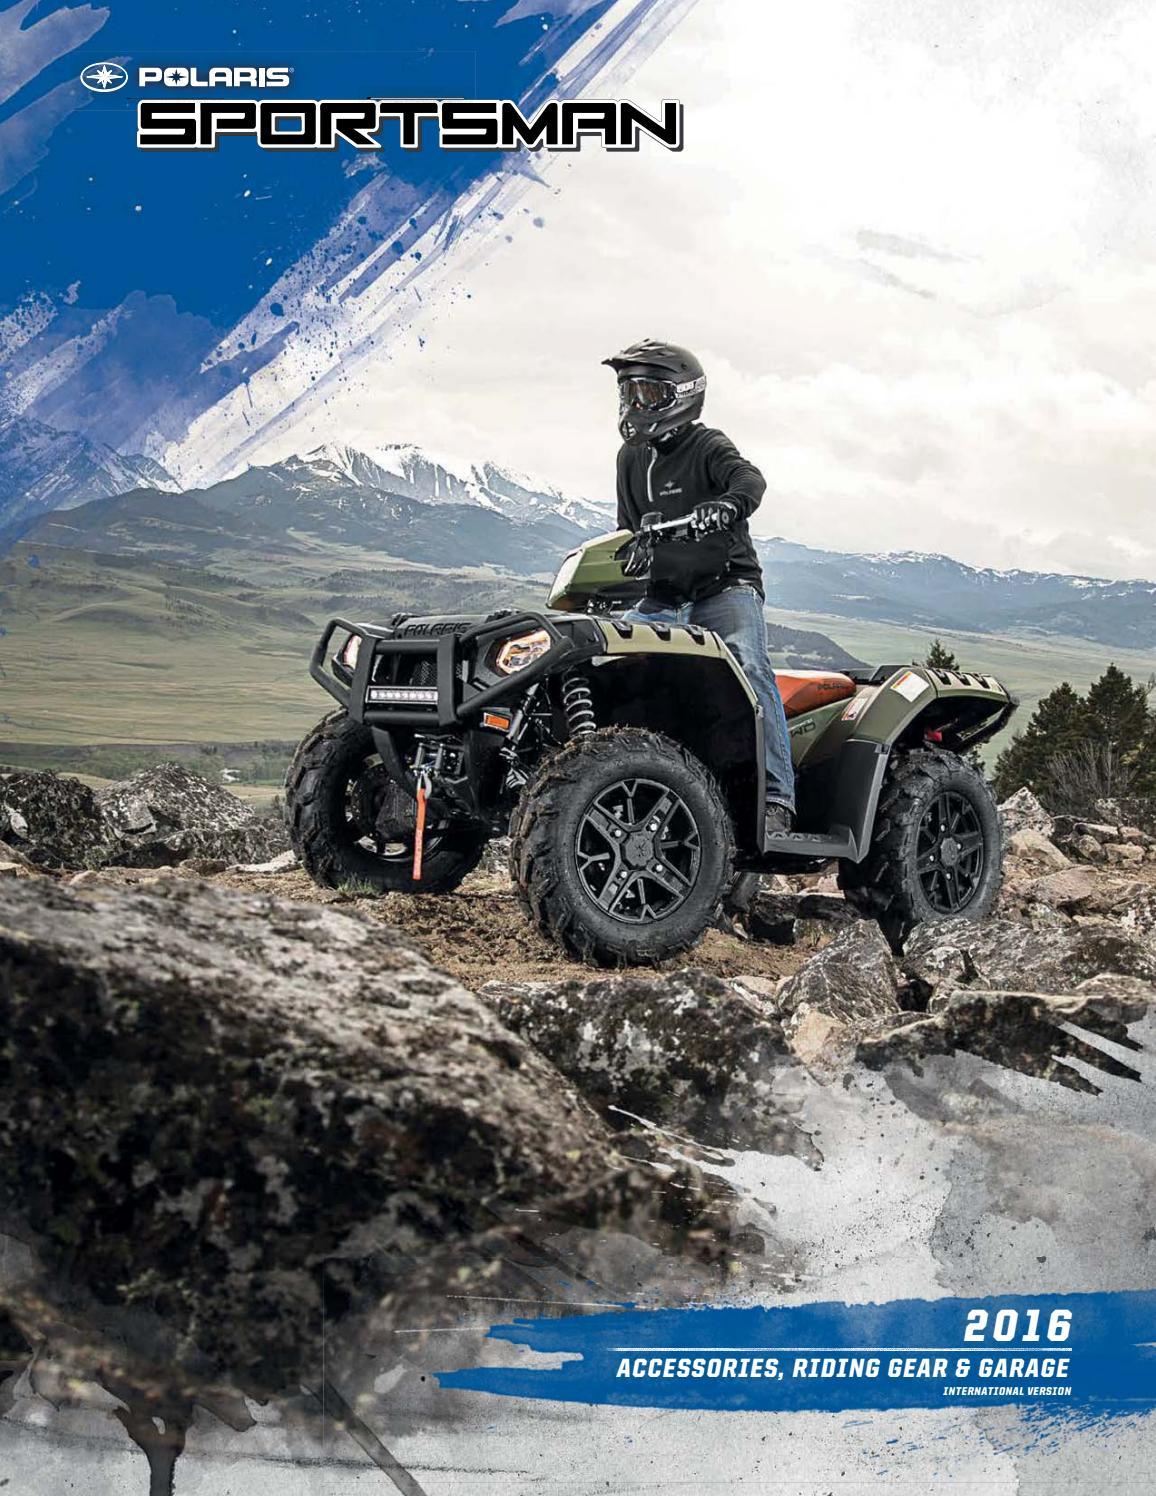 Open Trail 2.0 Rear Wheel HD CV Axle Shaft Fits 11-14 Polaris RZR XP 900